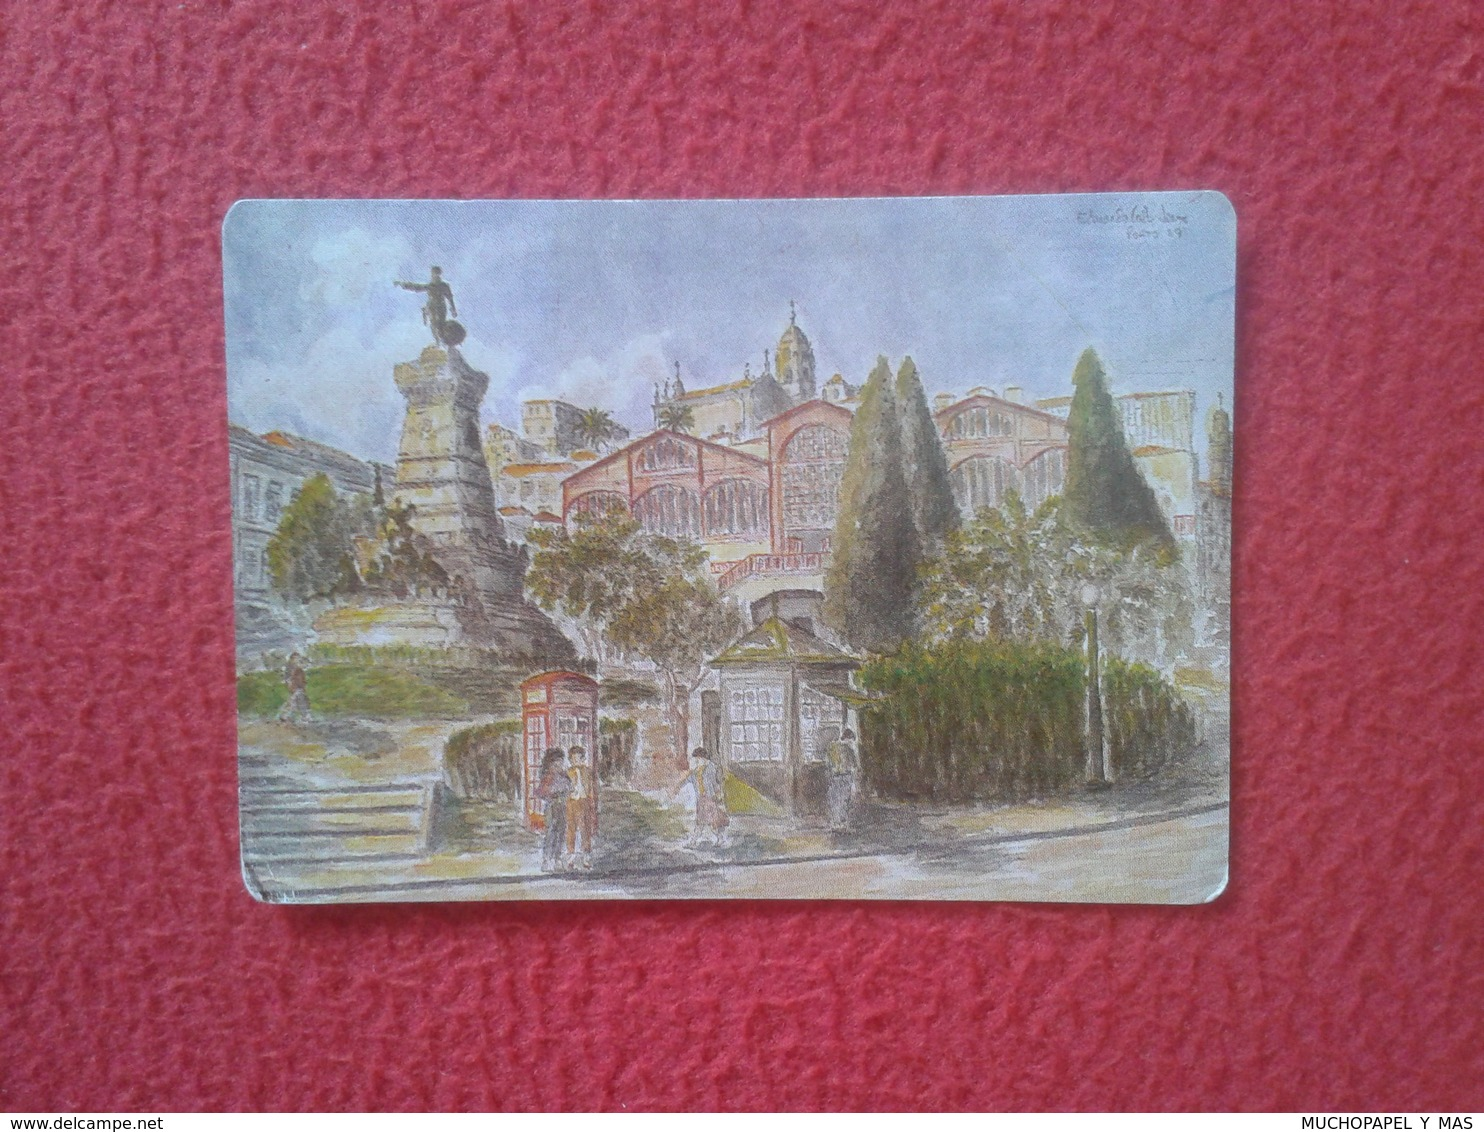 CALENDARIO DE BOLSILLO MANO PORTUGAL PORTUGUESE CALENDAR 1991 OFICINA S. SAN JOSÉ TIPOGRAFÍA PORTO OPORTO VER FOTO/S Y D - Calendarios